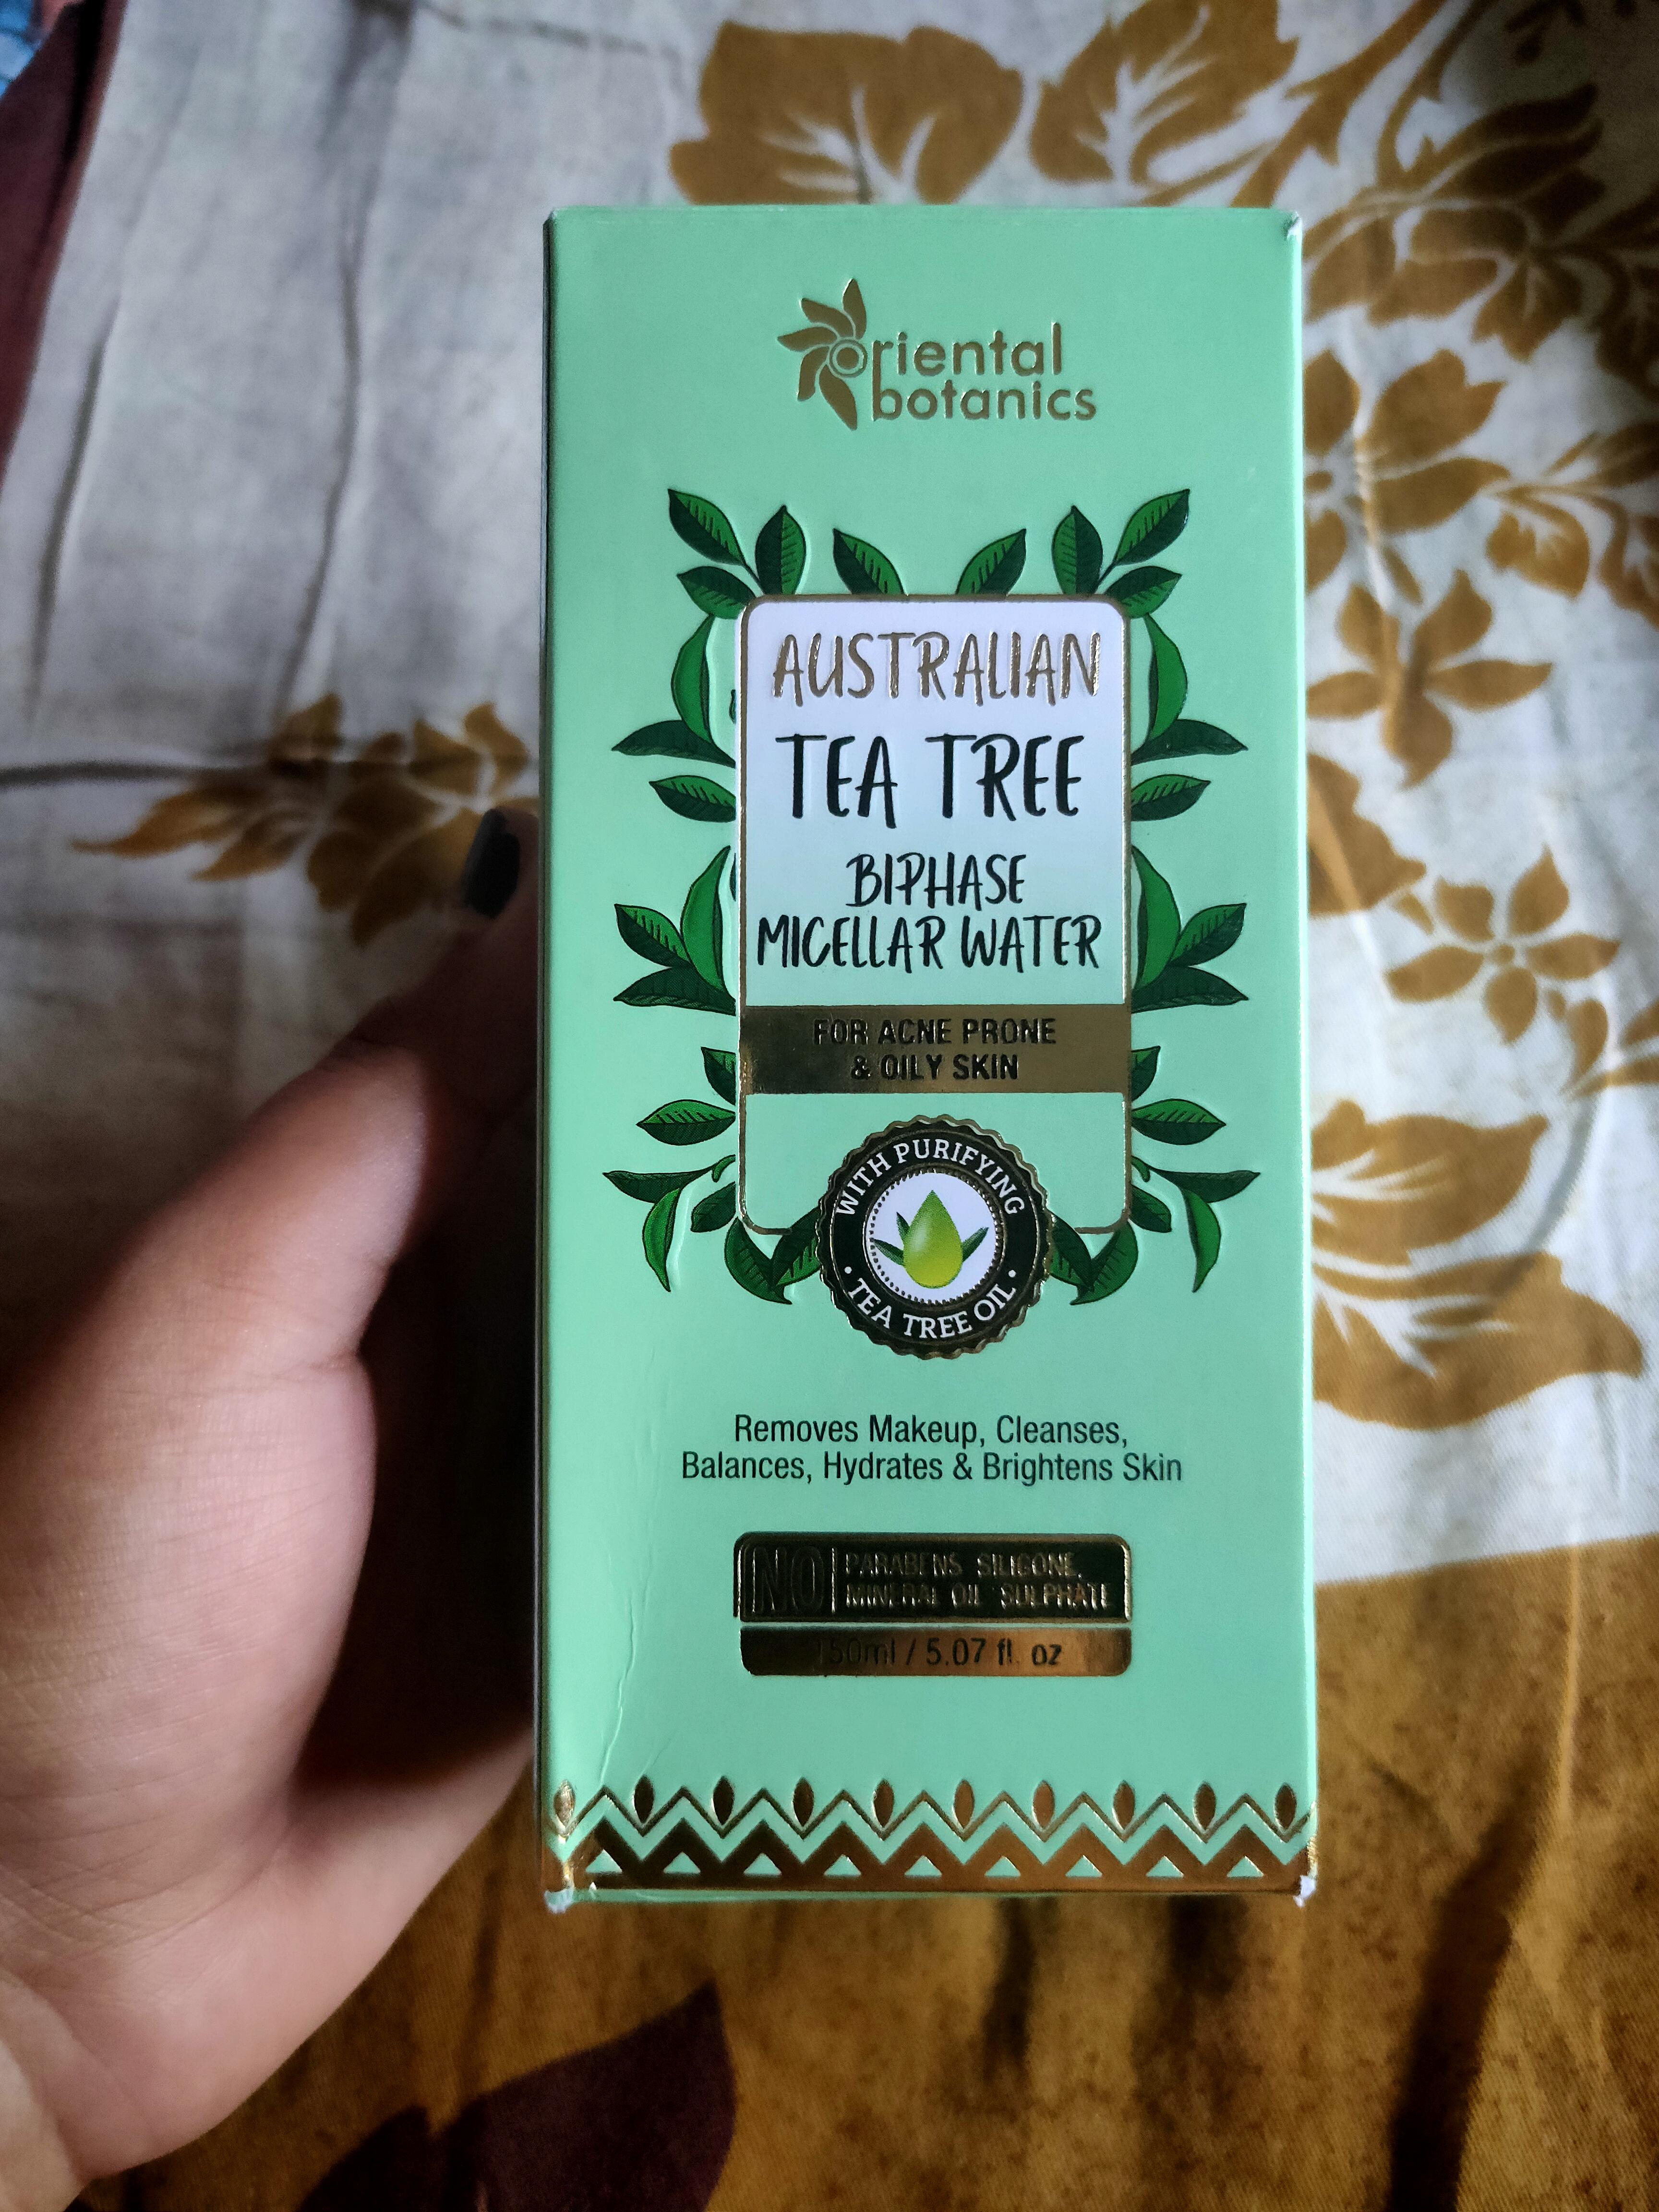 Oriental Botanics Australian Tea Tree Bi-Phase Micellar Water-BEST MICELLAR WATER FOR OIL-By garima_kumu-3